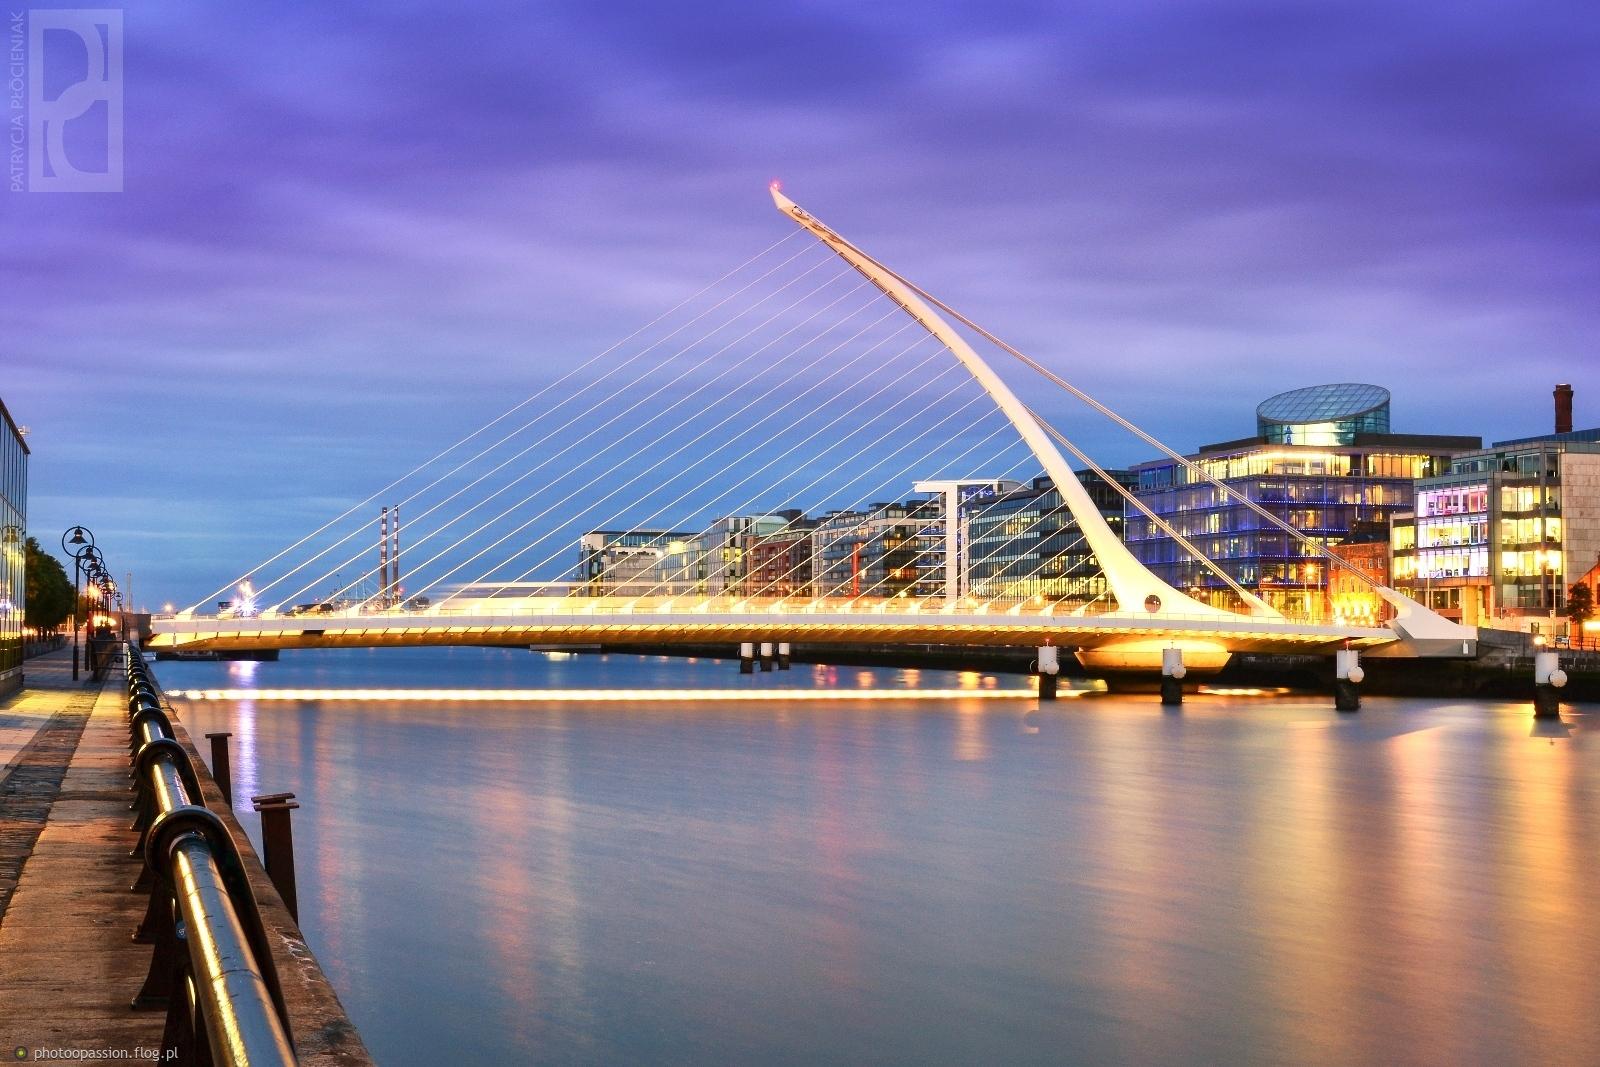 Smauel Beckett Bridge Dublin, mój faworyt numer 1 !